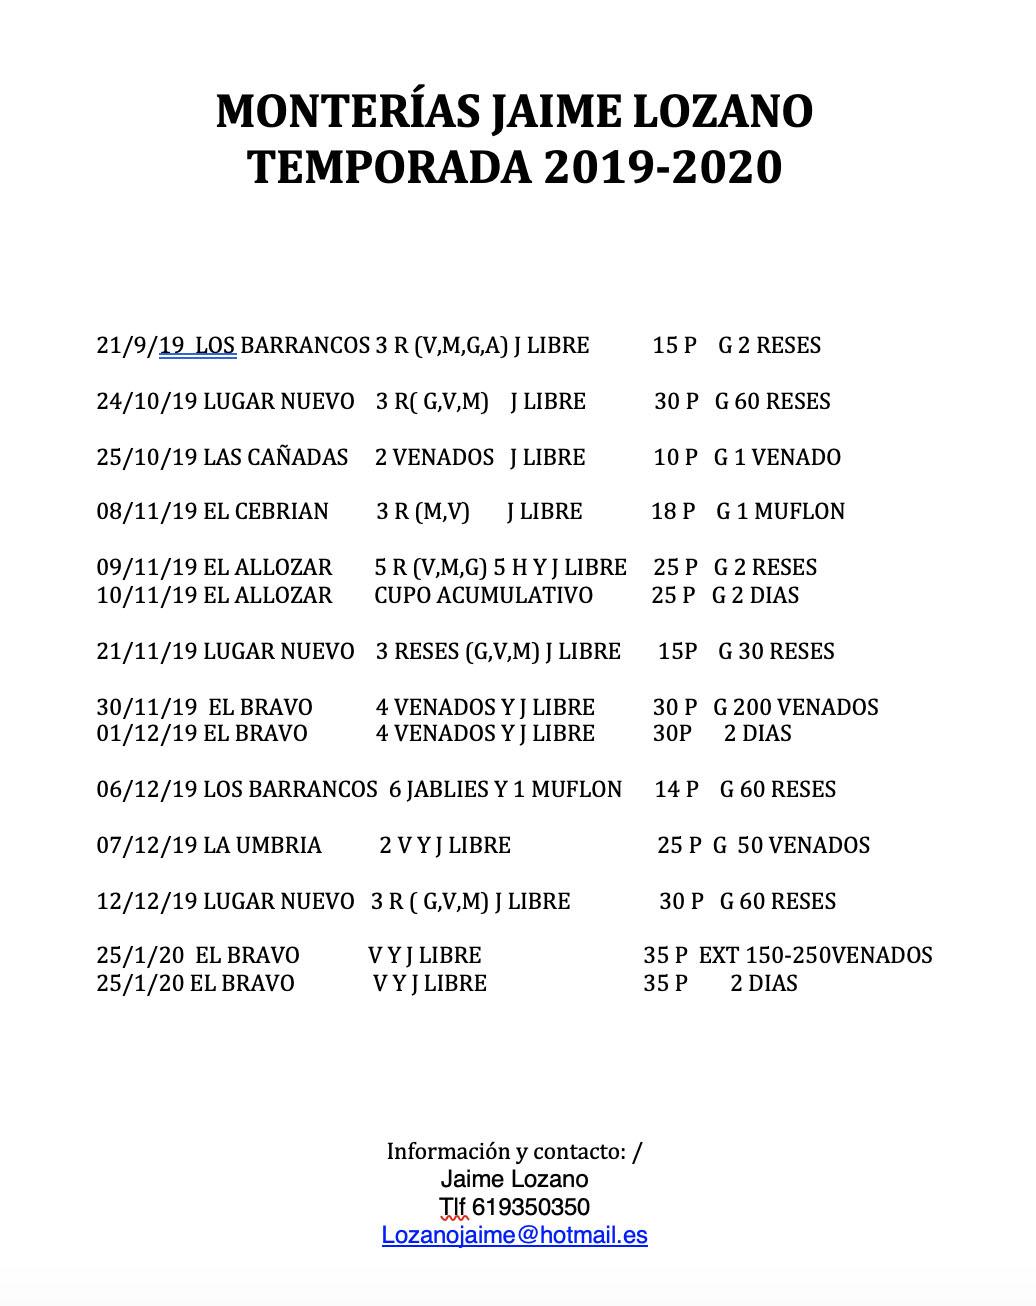 Programa Monterias Jaime Lozano